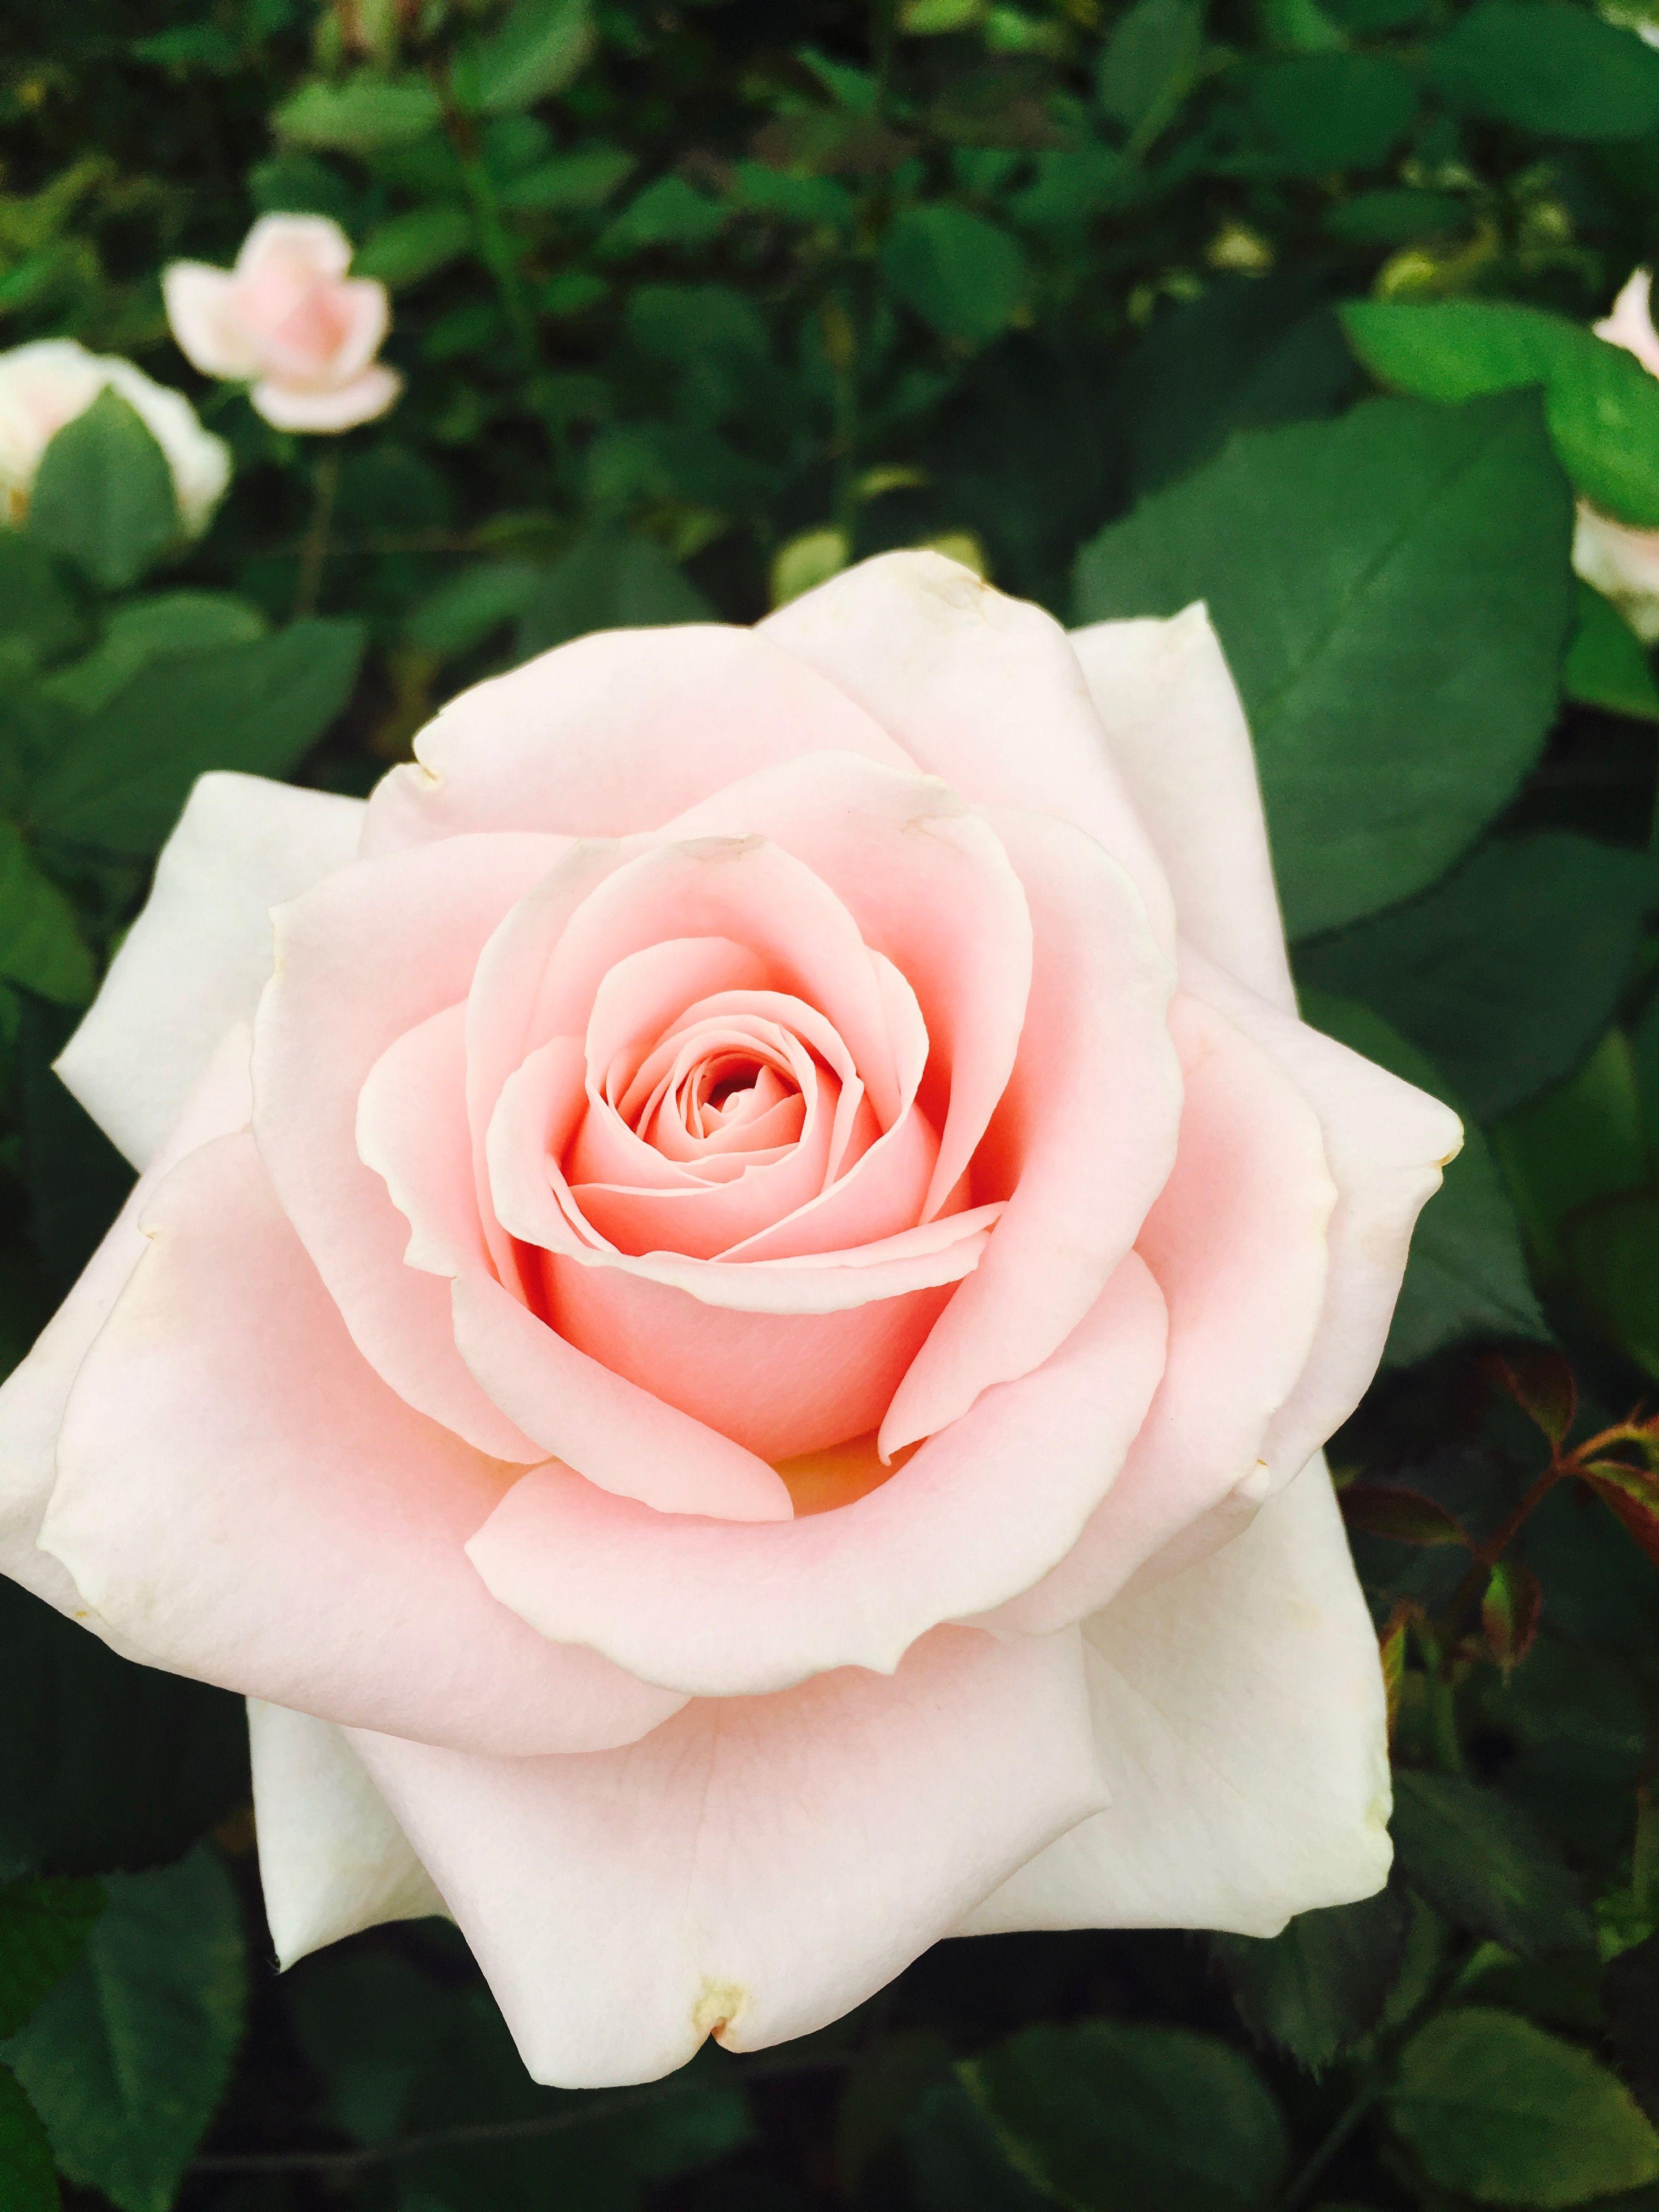 Nature Rose Pinkrose Nature Flower Flowers Love Beauty Beautyinnature Flowers Rose Beautiful Flowers